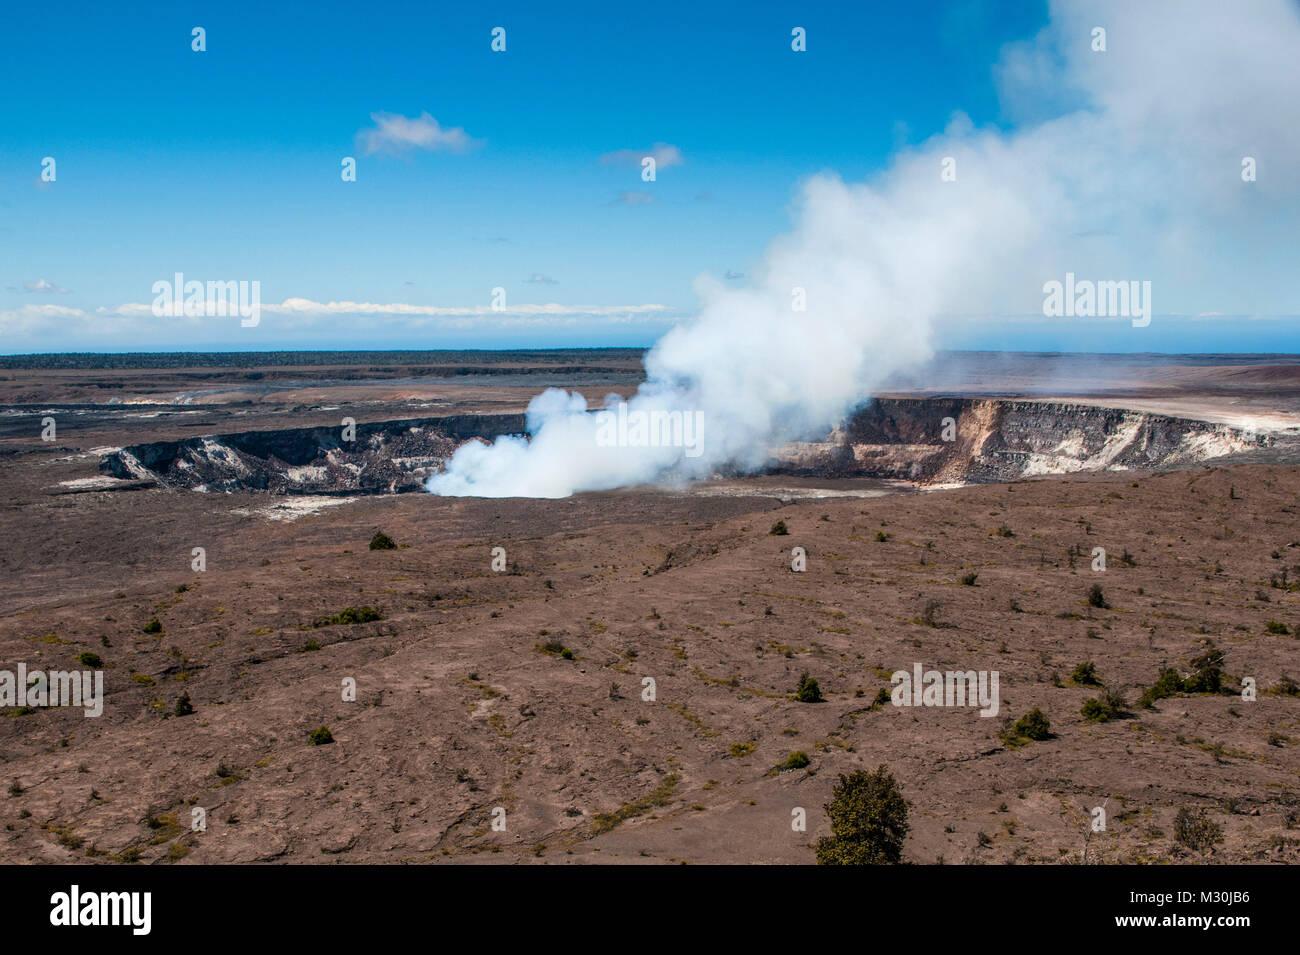 Smoking K?lauea Summit Lava Lake in the Hawaii Volcanoes National Park, Big Island, Hawaii - Stock Image